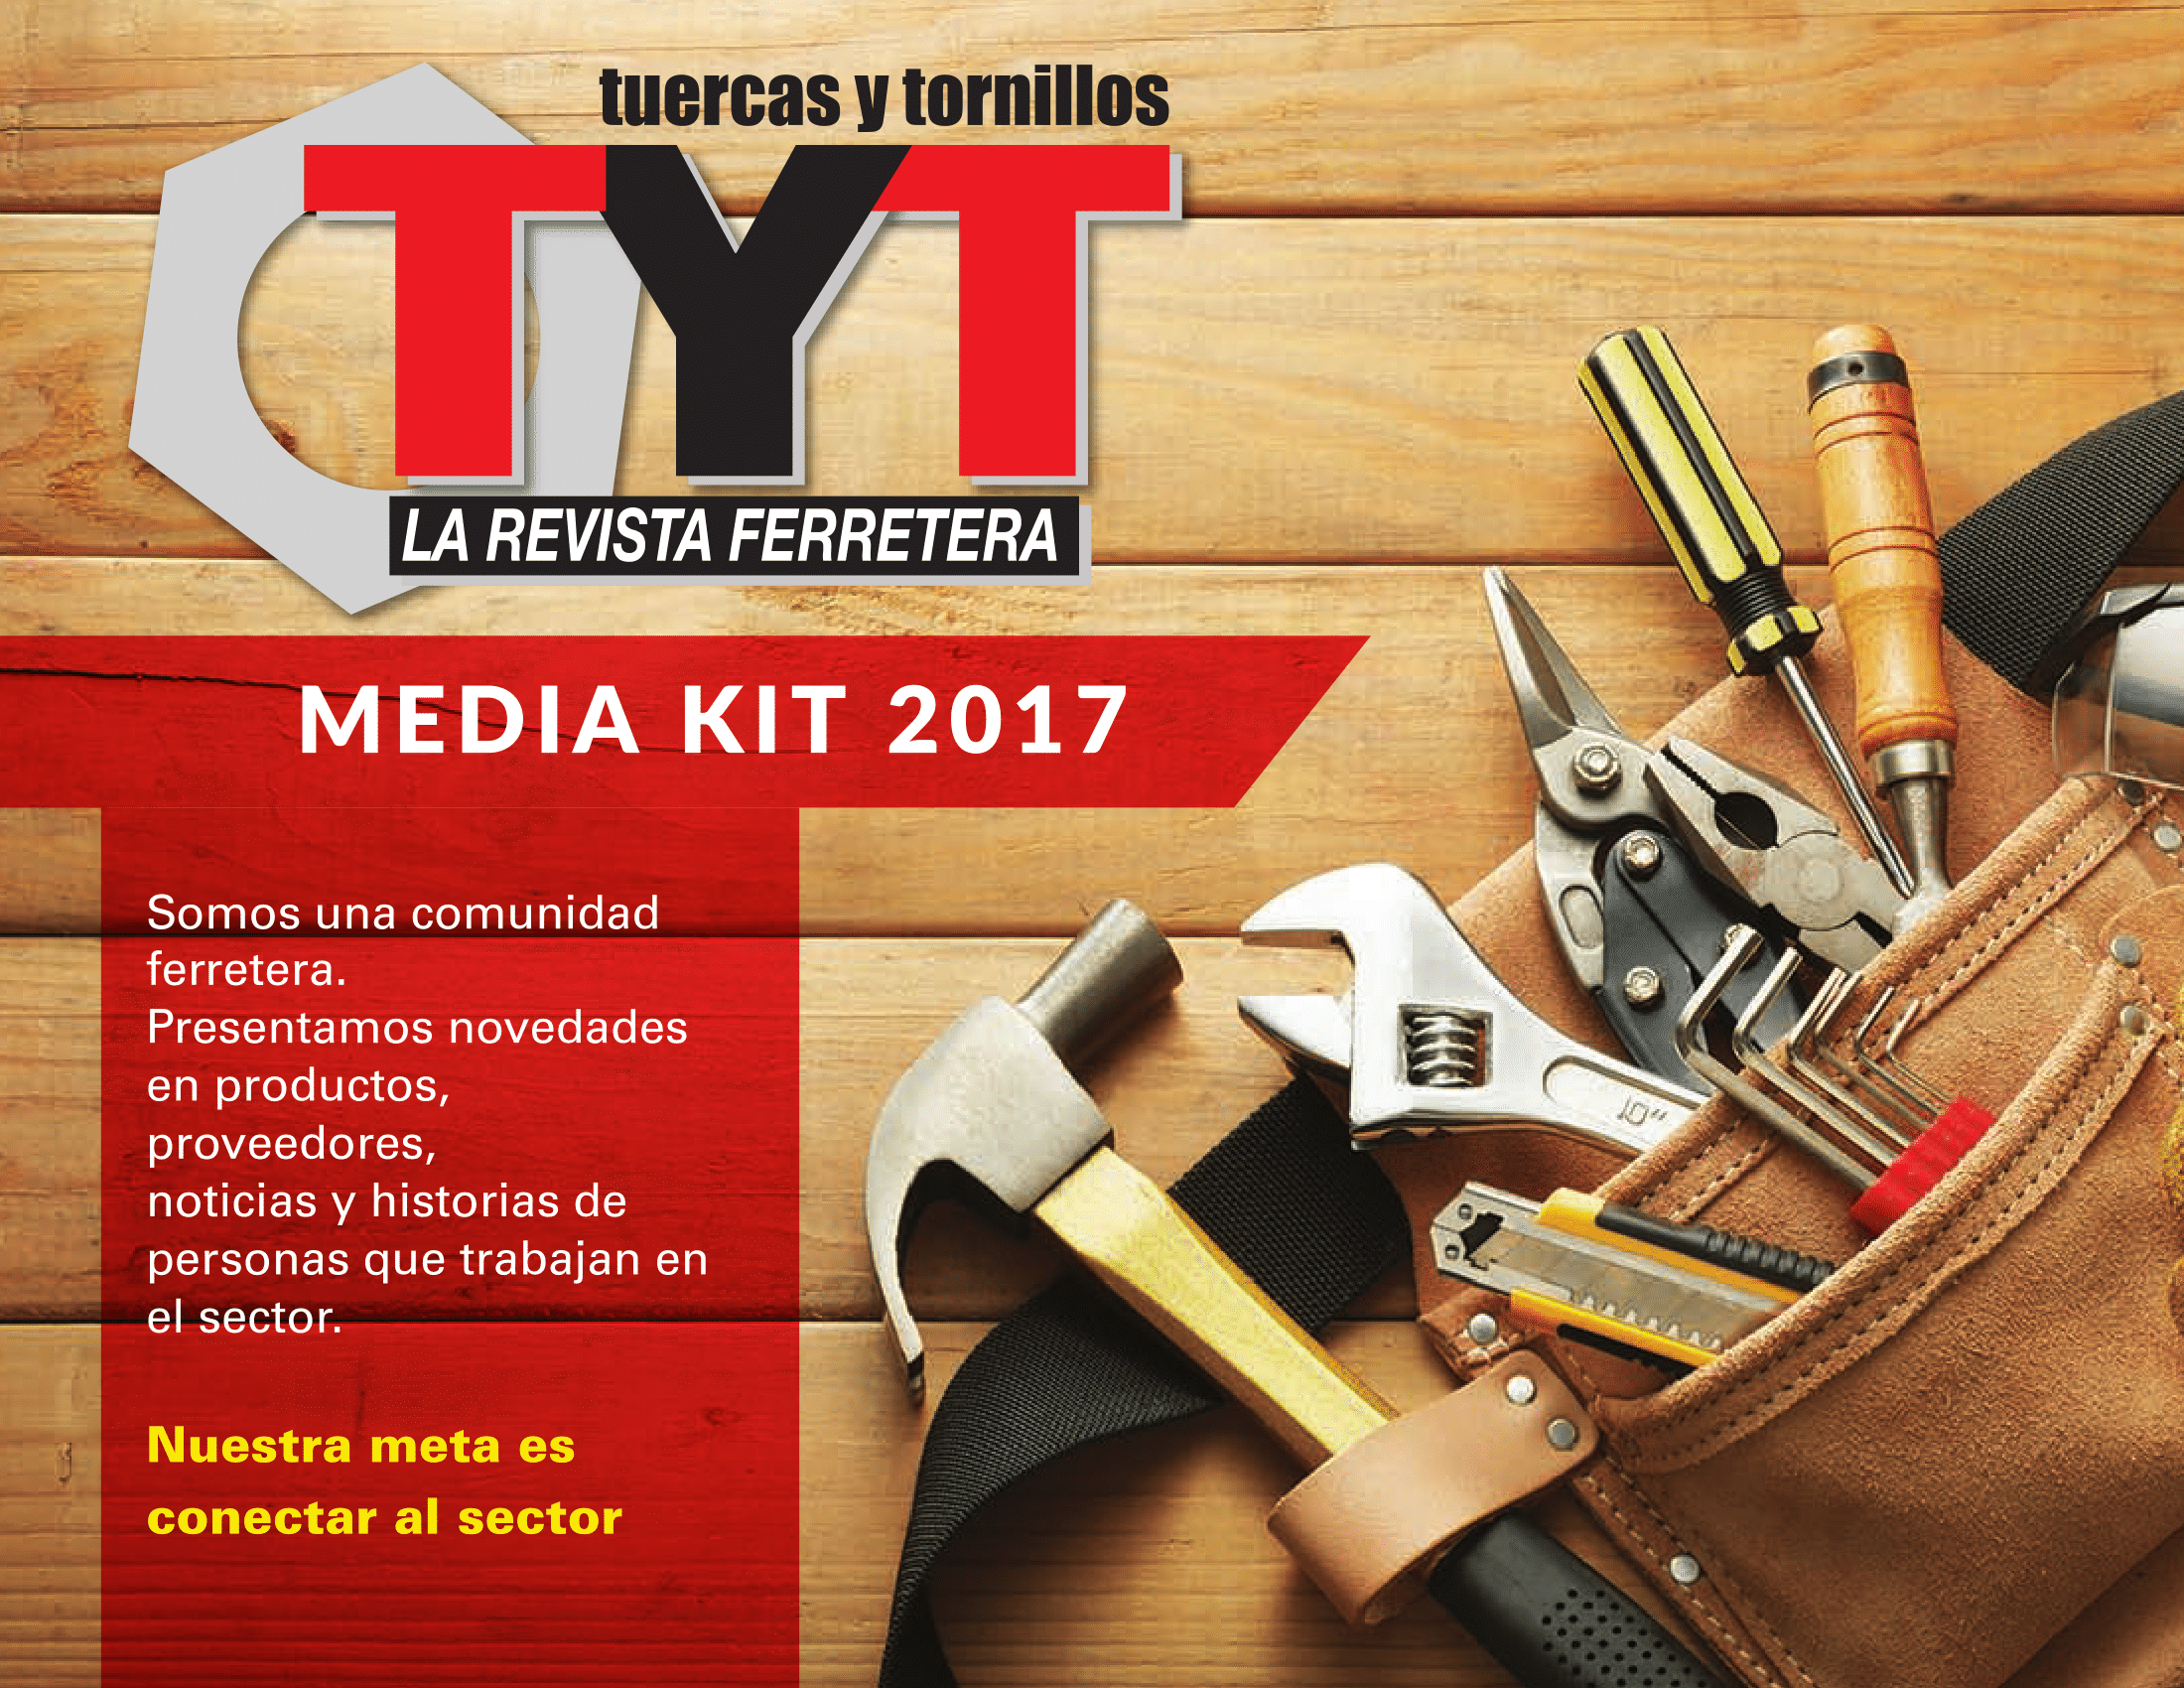 Media Kit TYT 2017- 2(1) (1)-1